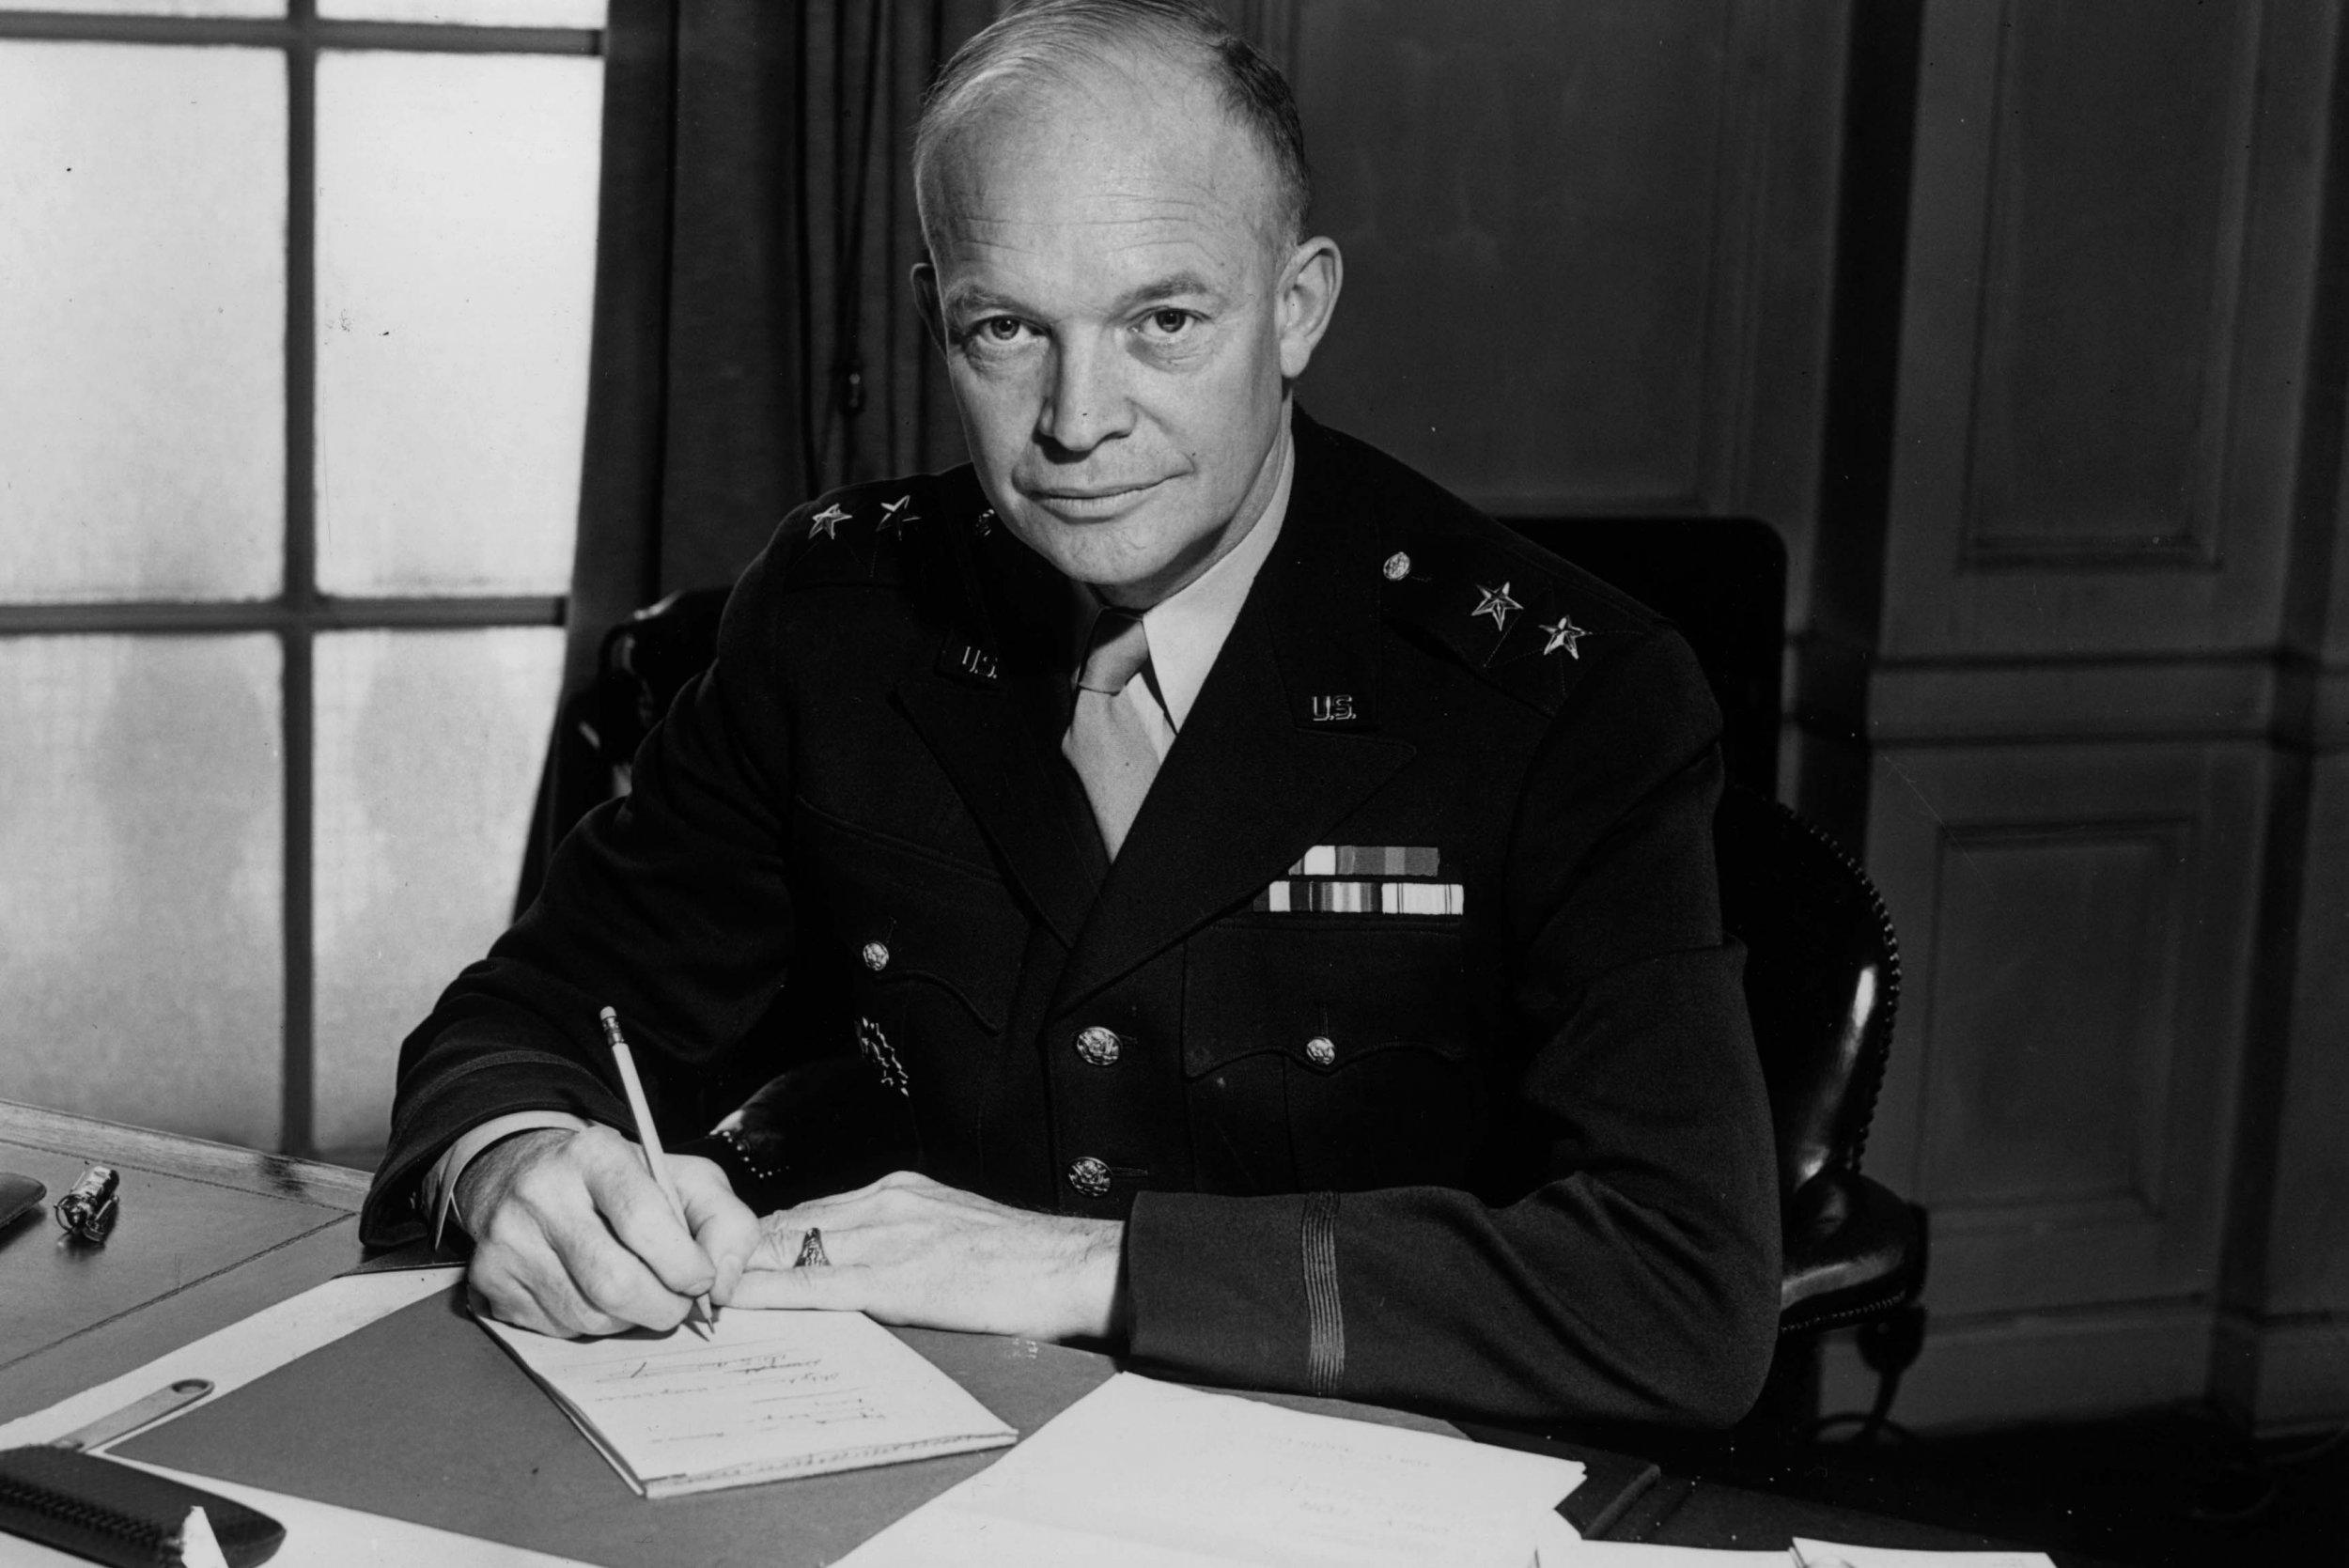 07 Dwight Eisenhower